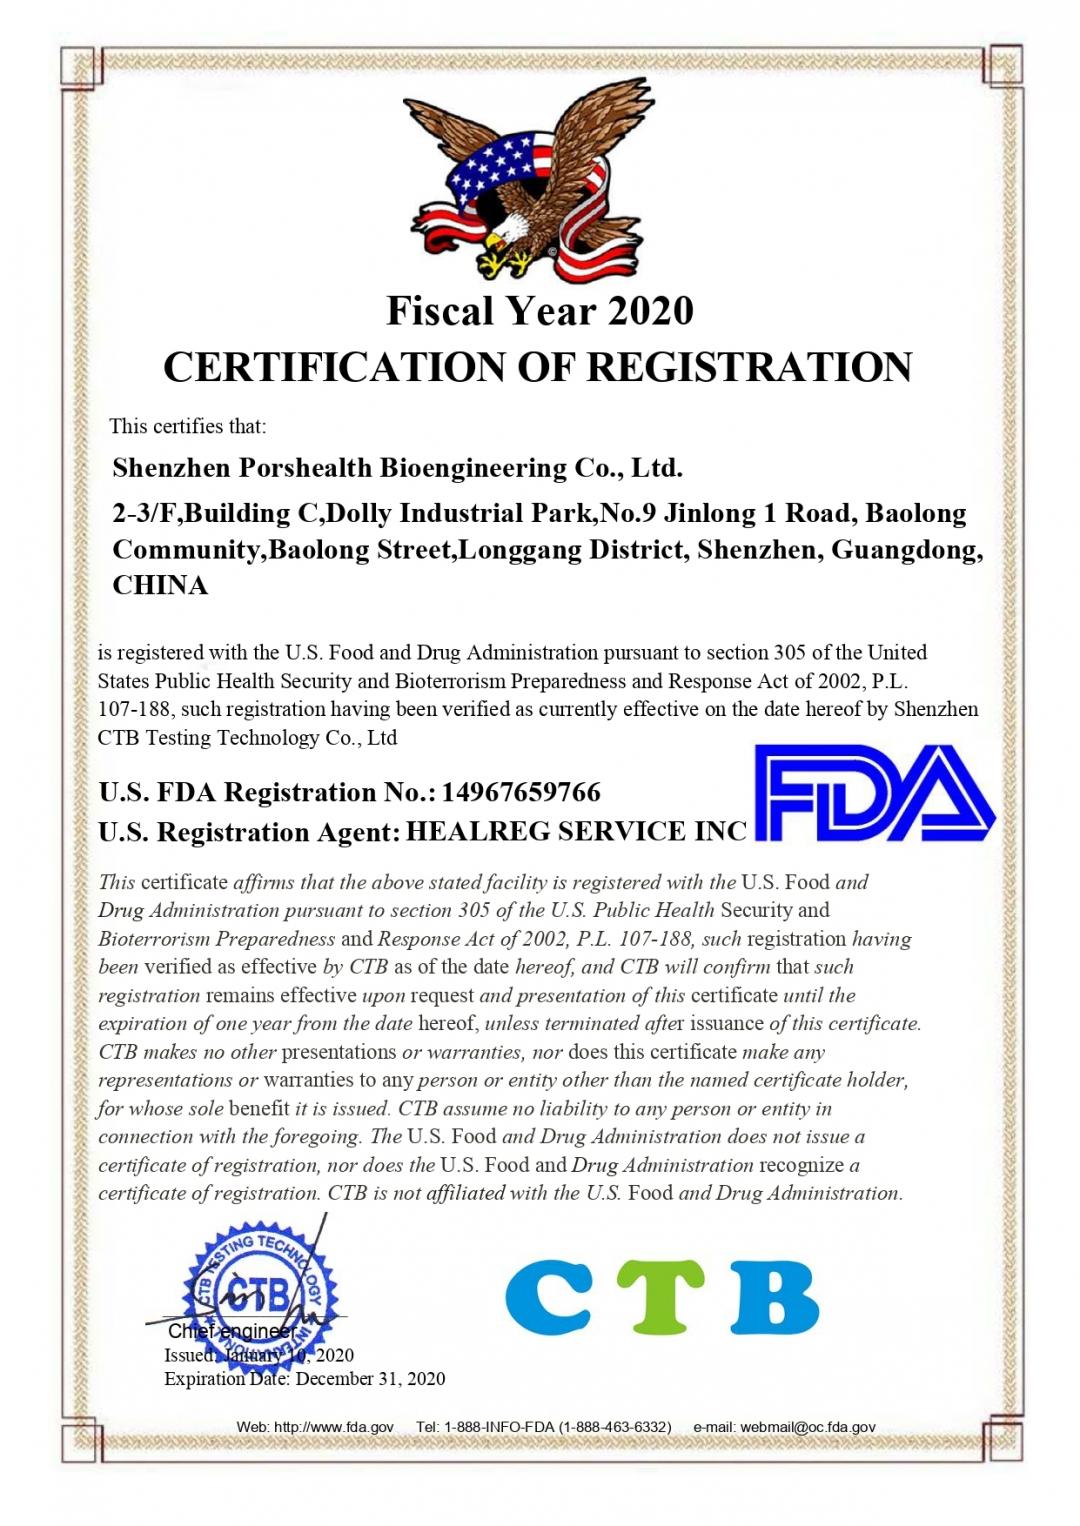 FDA-Shenzhen Porshealth Bioengineering Co., Ltd..jpg